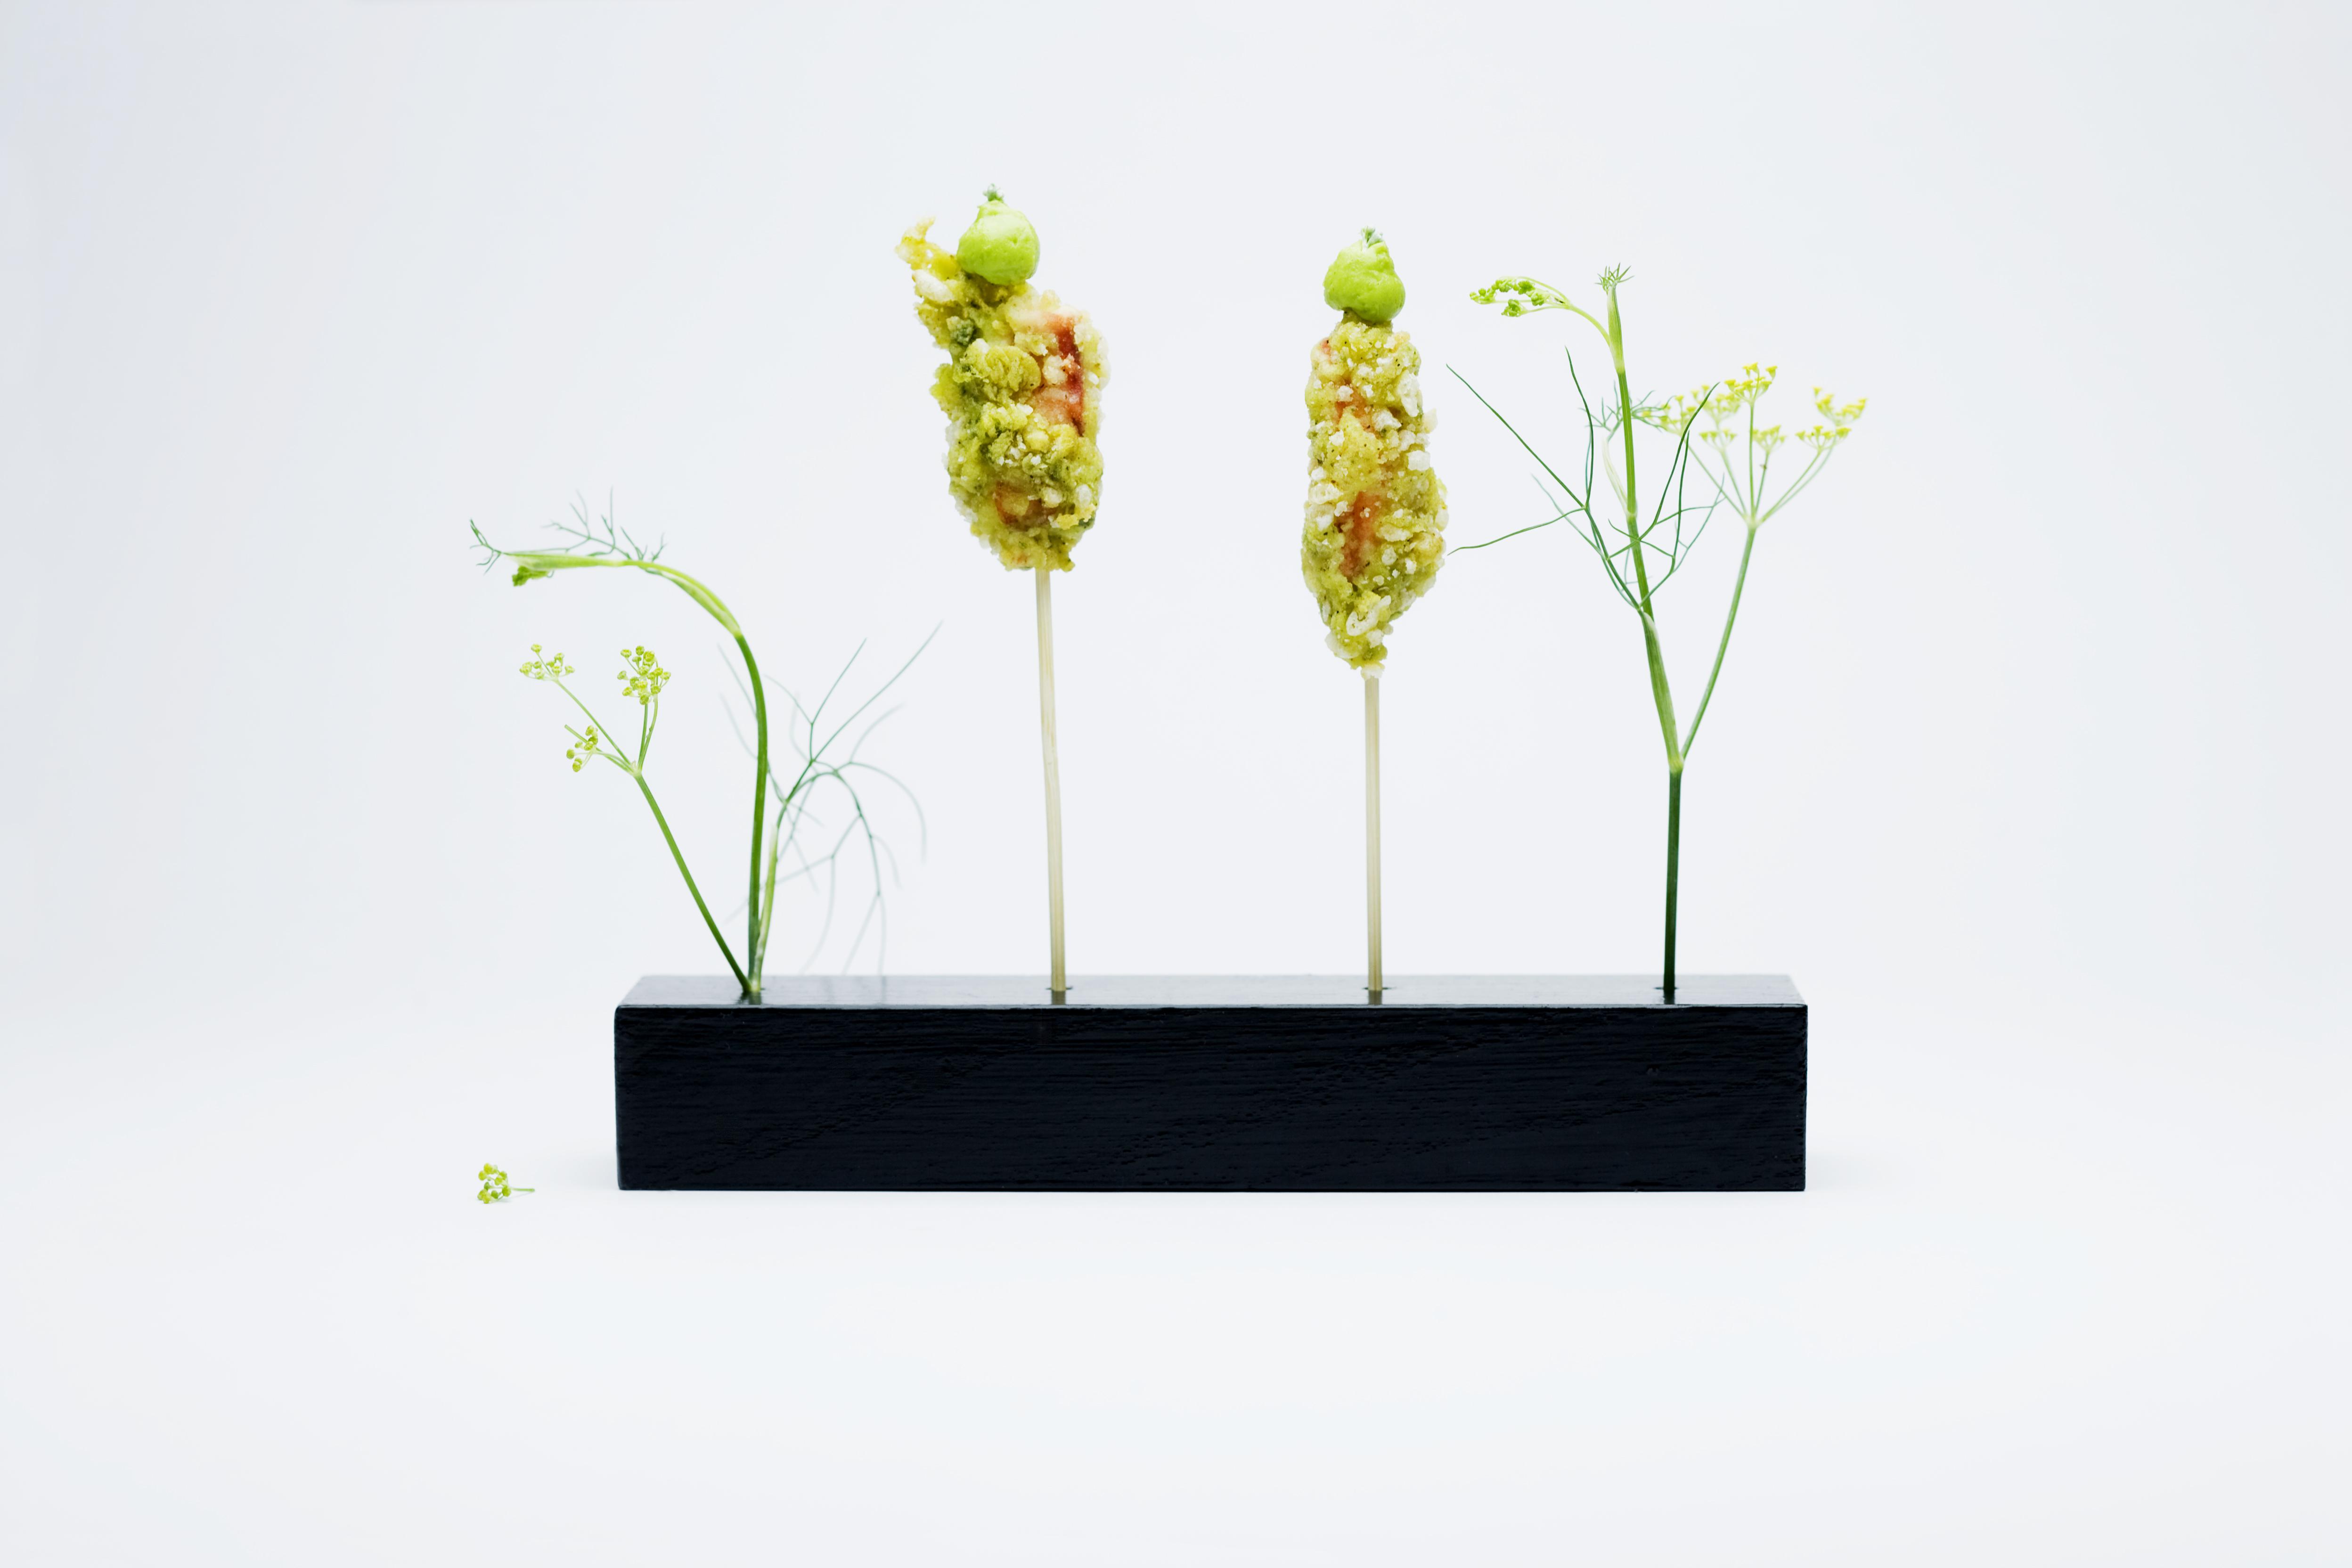 Installation mit Nährwert:Hummer-Fenchel-Blüten-Tempura mit Avocado-Sencha-Creme.